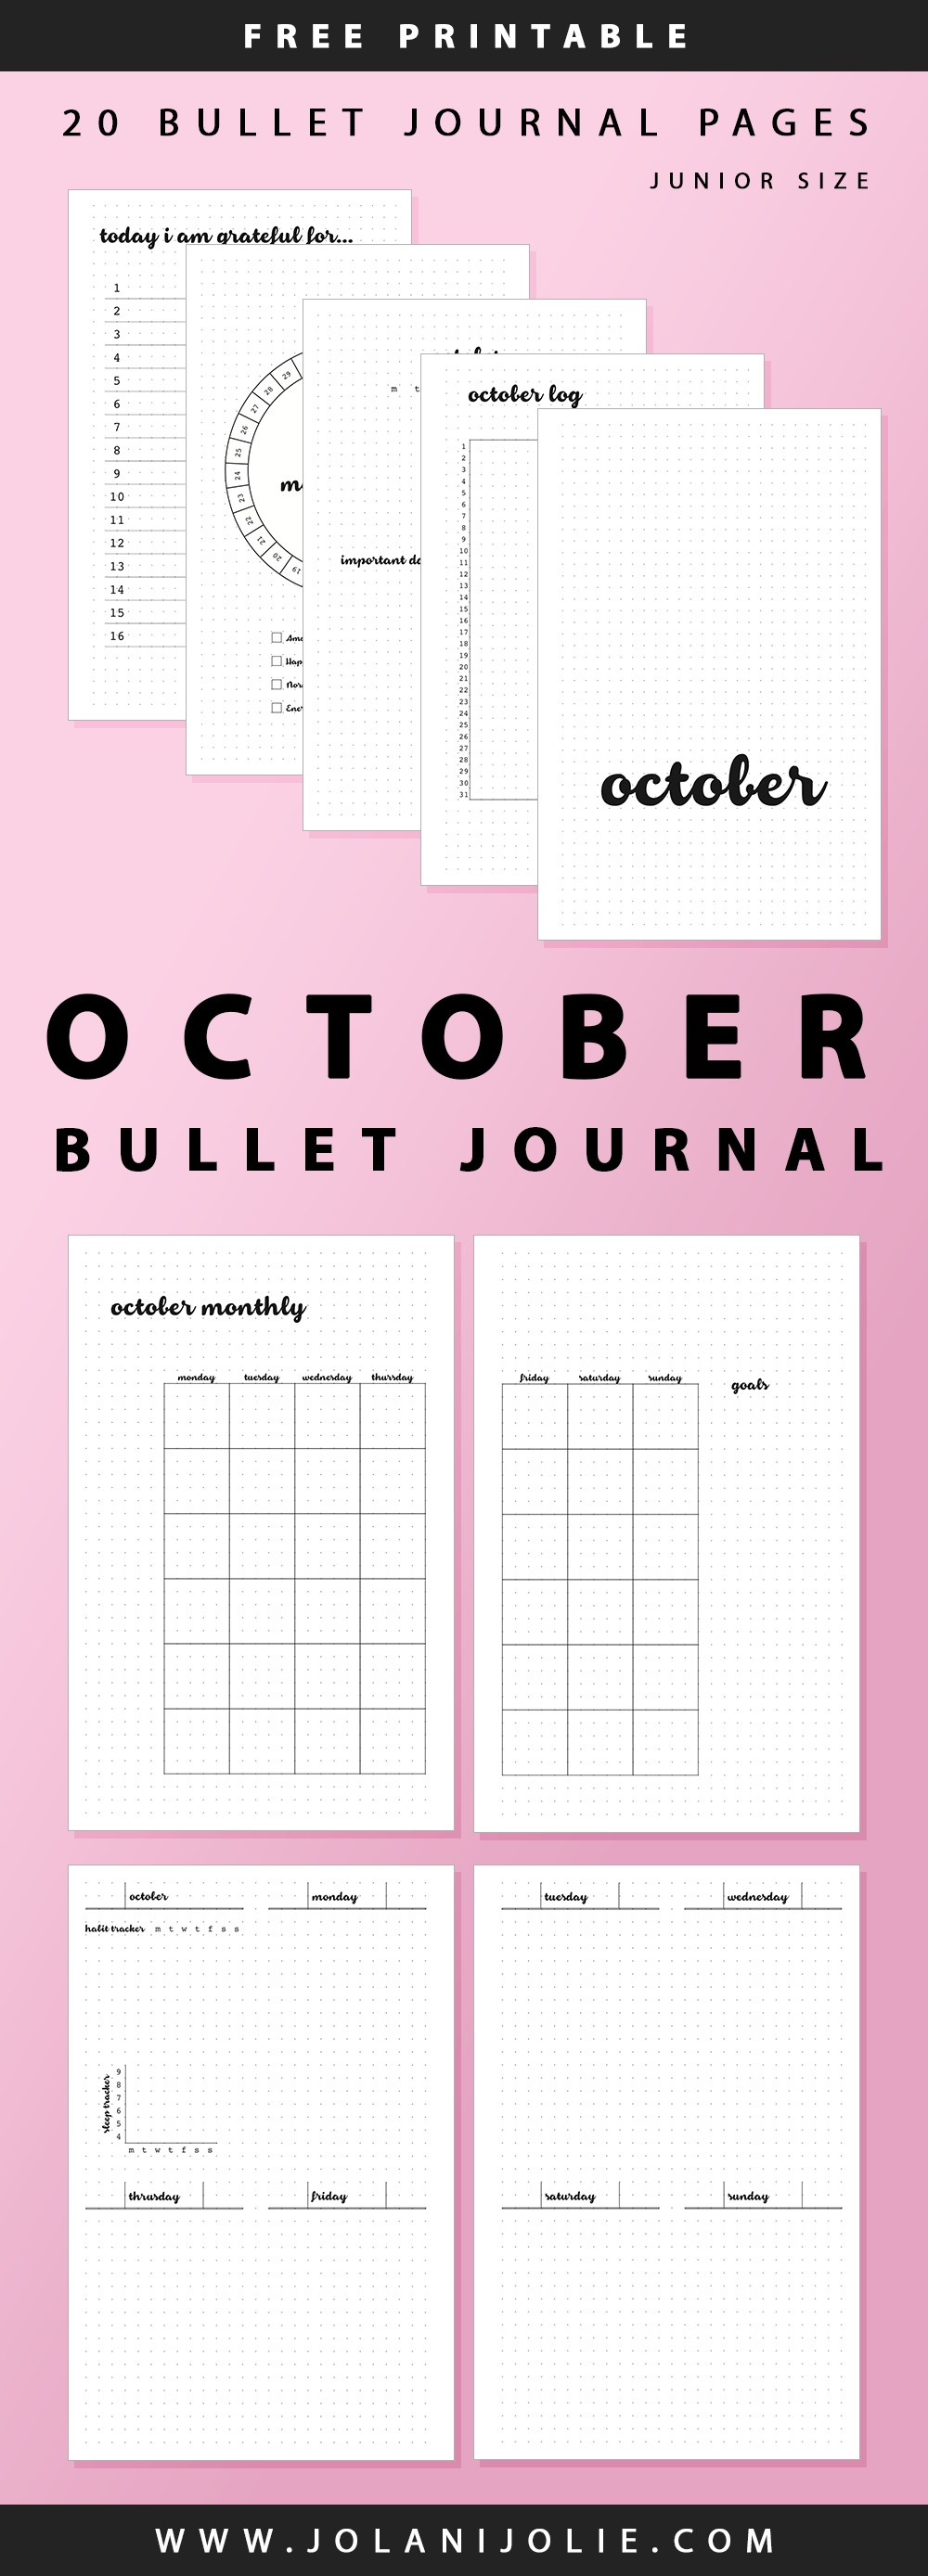 Undated October Bullet Journal – jolanijolie